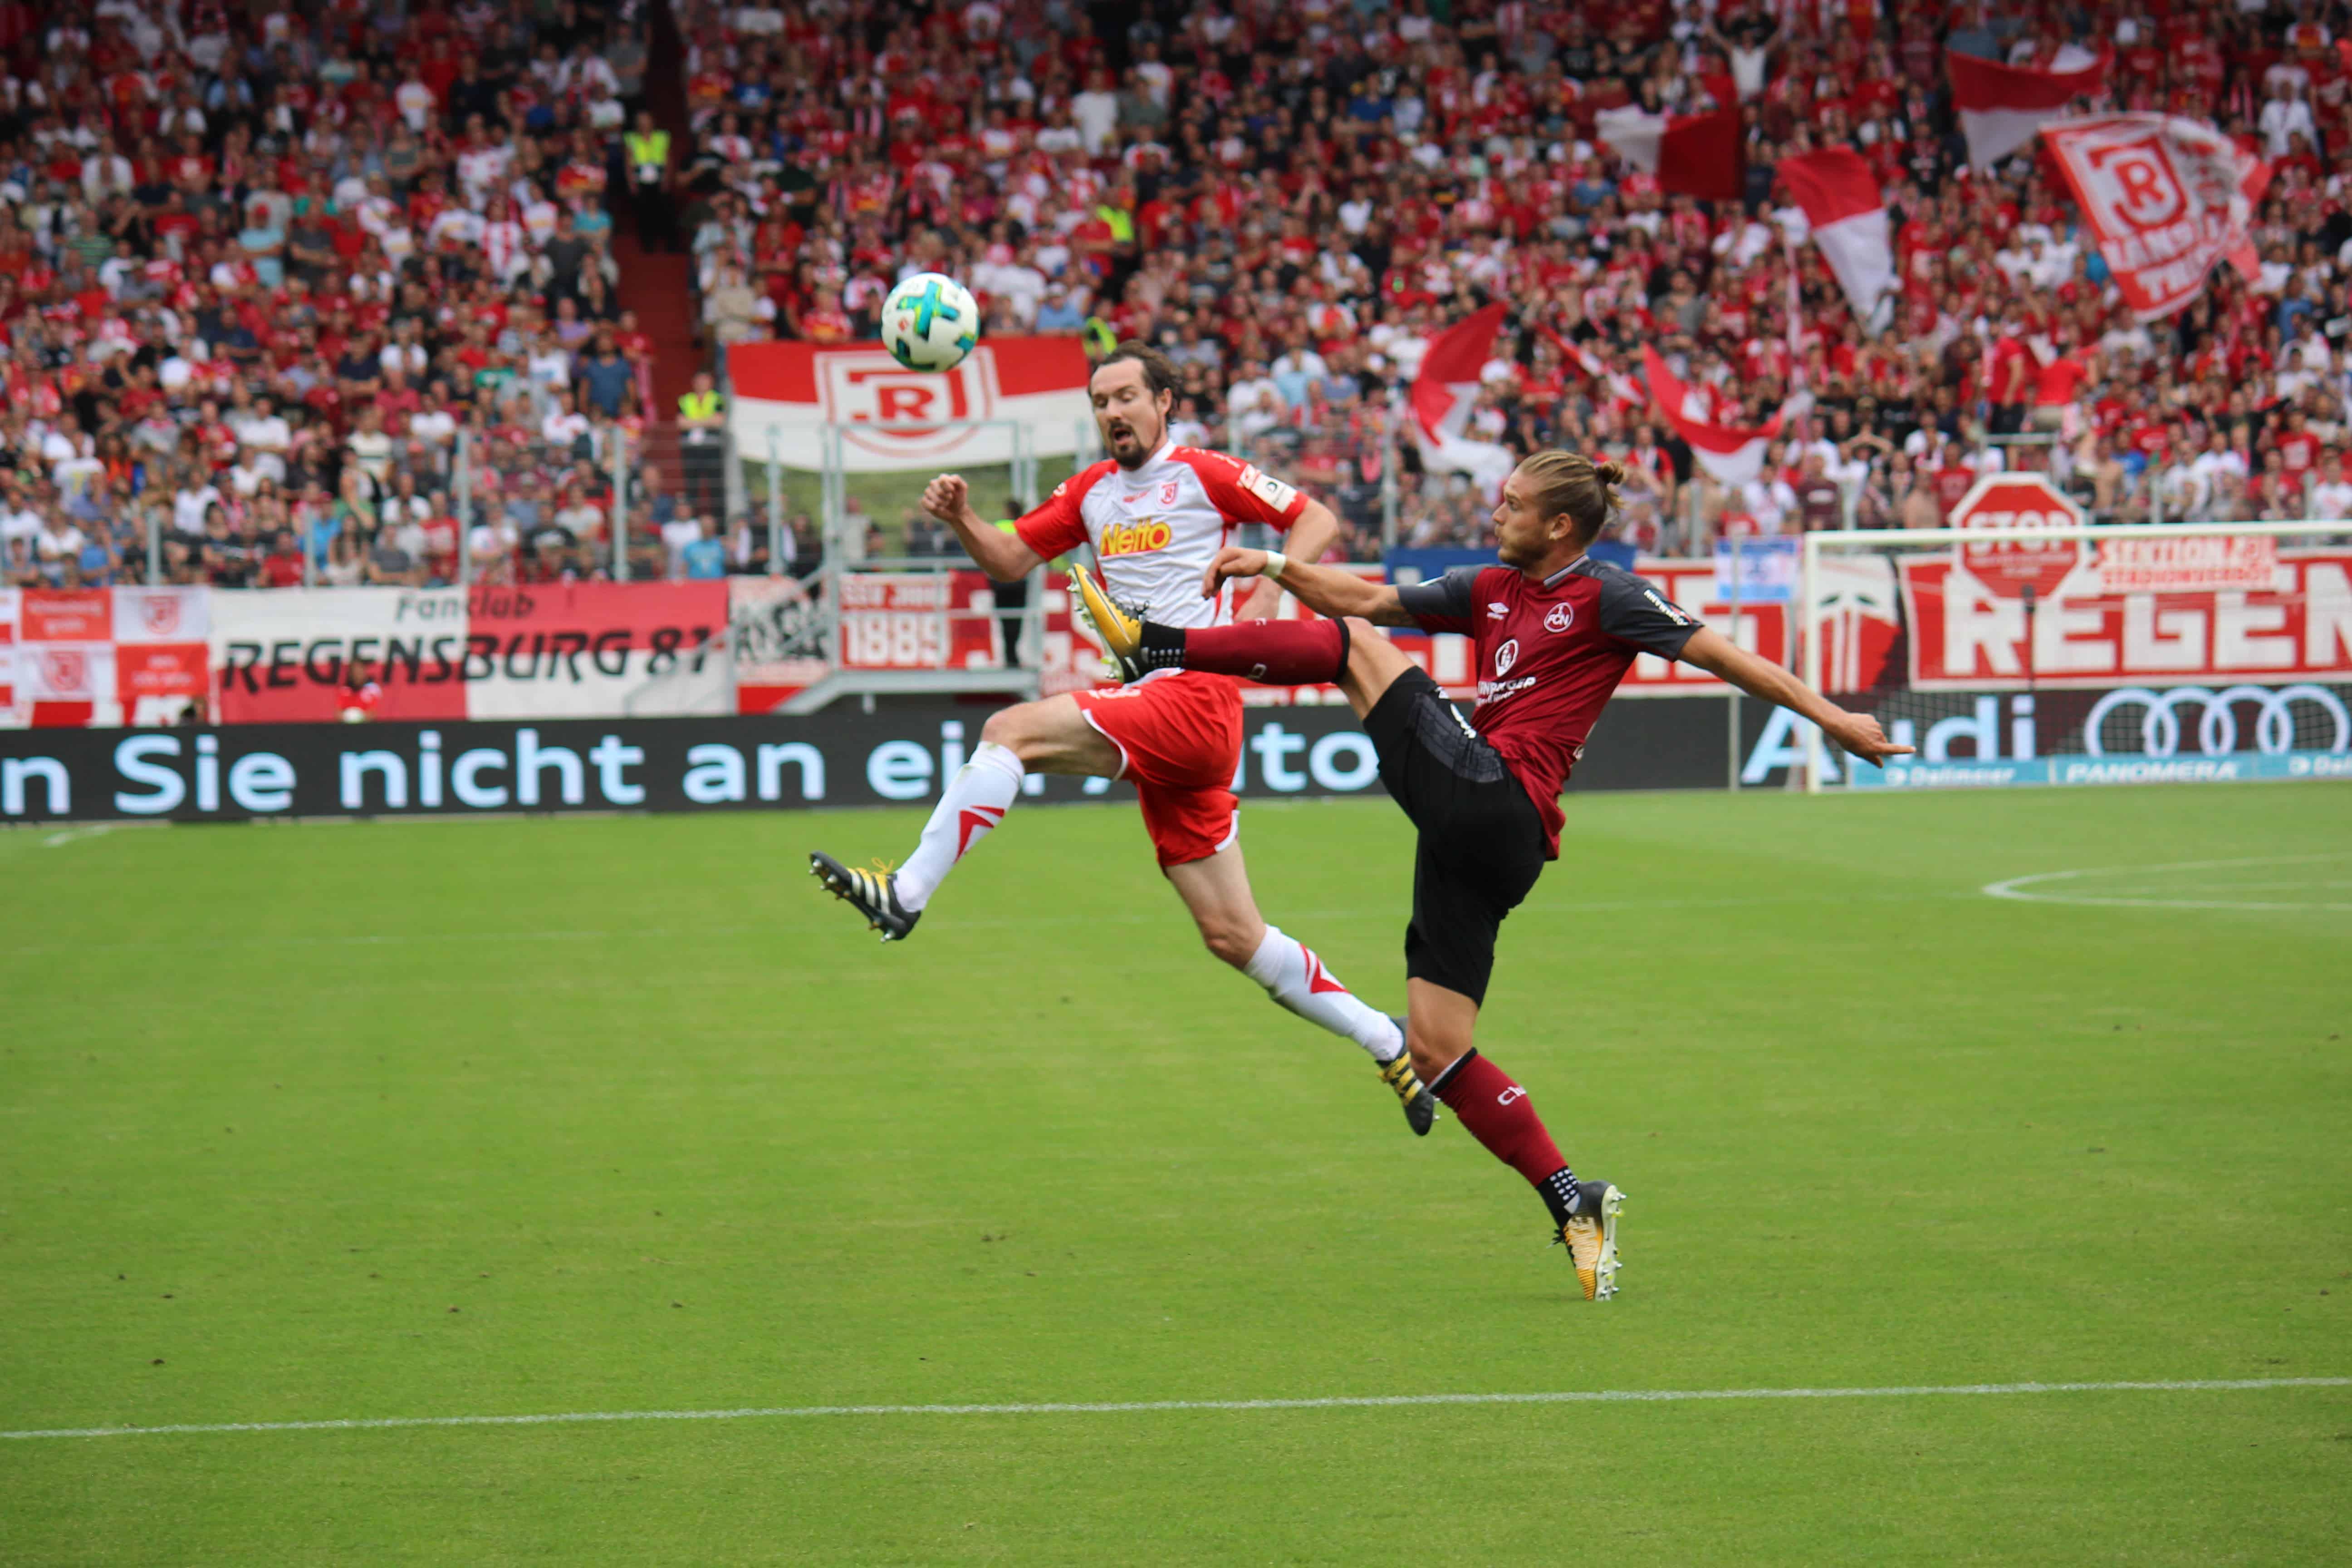 DFB-Pokal: Jahn Regensburg empfängt Darmstadt 98